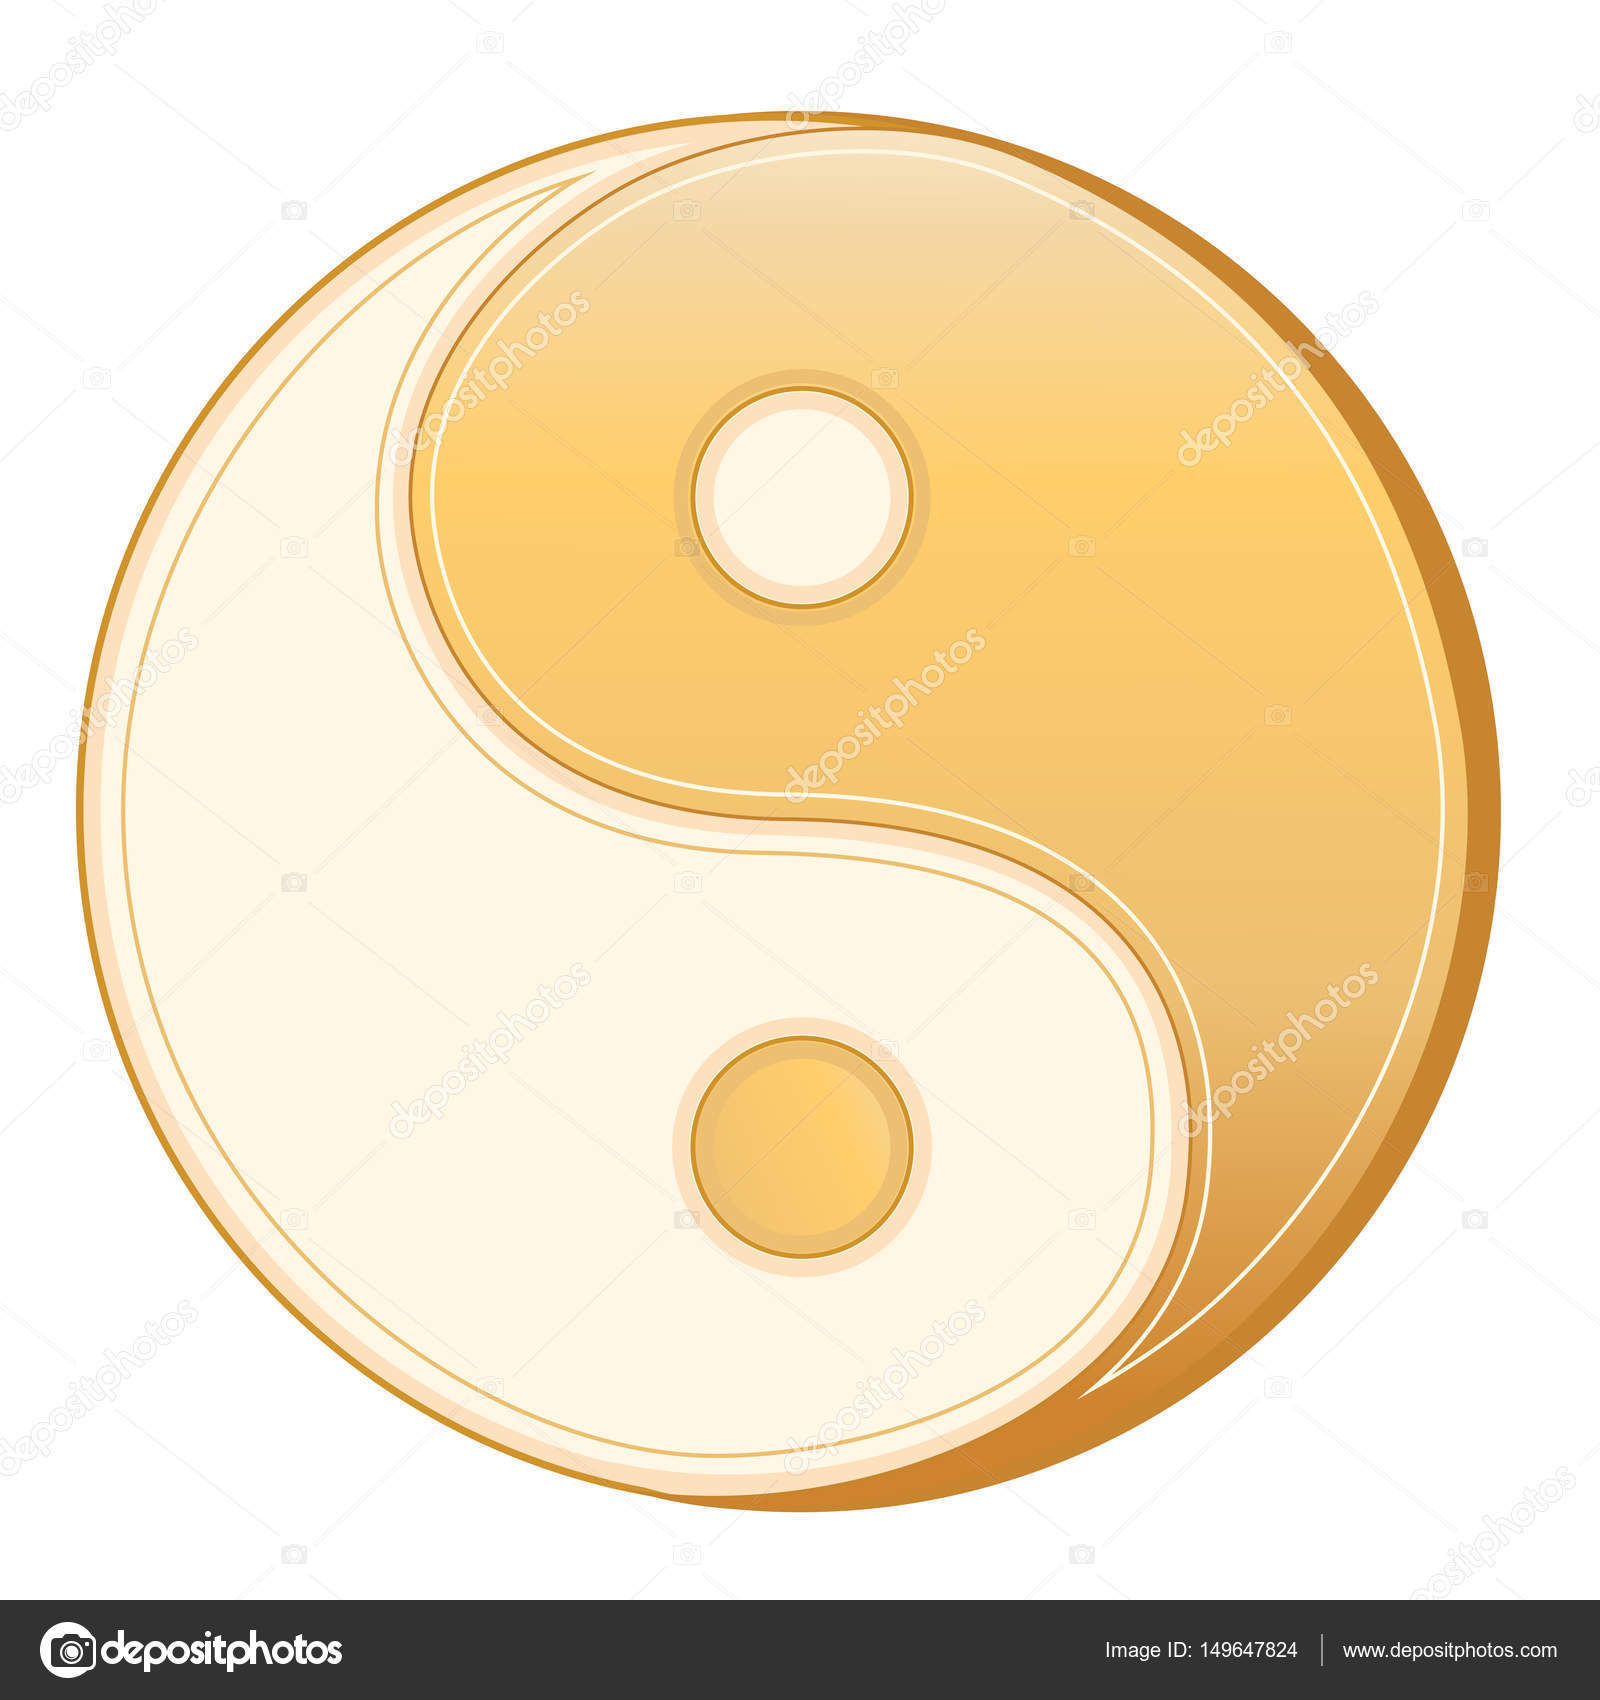 The tao symbol image collections symbol and sign ideas taoism symbol yin yang stock vector casejustin 149647824 taoism symbol yin yang stock vector buycottarizona buycottarizona